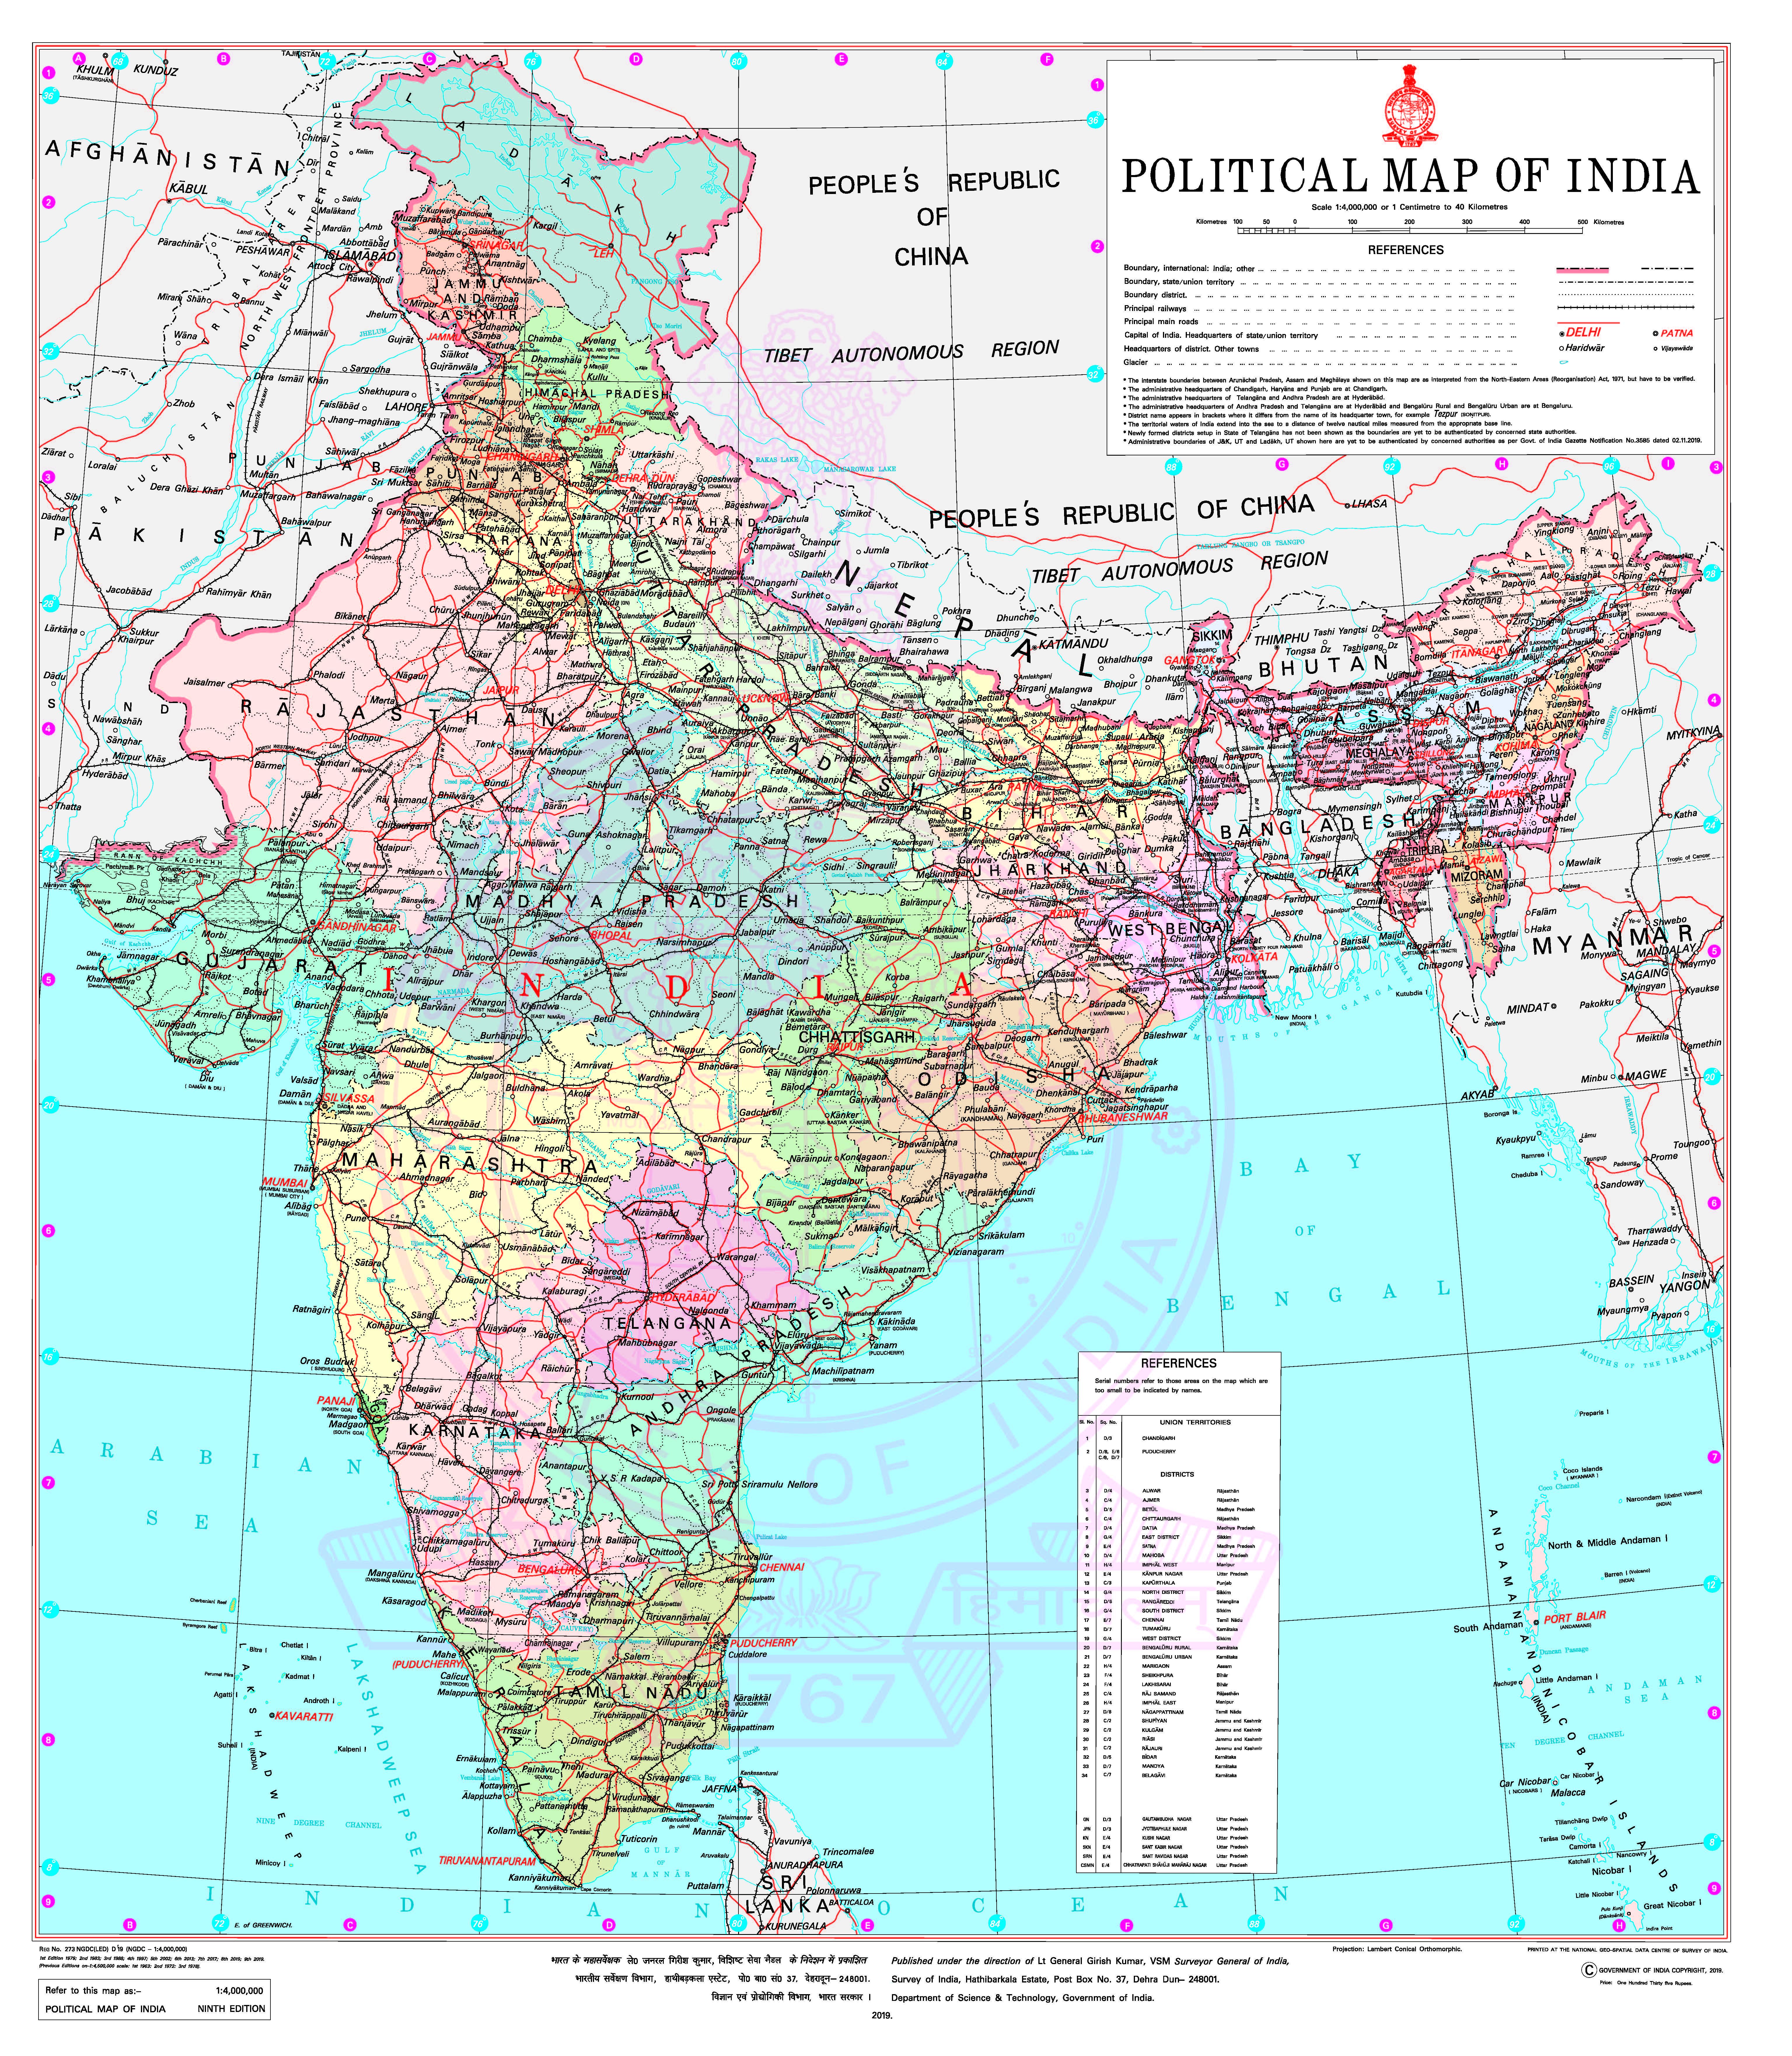 Political Map of India: Survey of India on andhra pradesh map, brazil map, sri lanka map, maharashtra map, australia map, africa map, canada map, europe map, karnataka map, time zone map, japan map, california map, indian subcontinent map, china map, russia map, france map, arabian sea map, texas map, korea map,